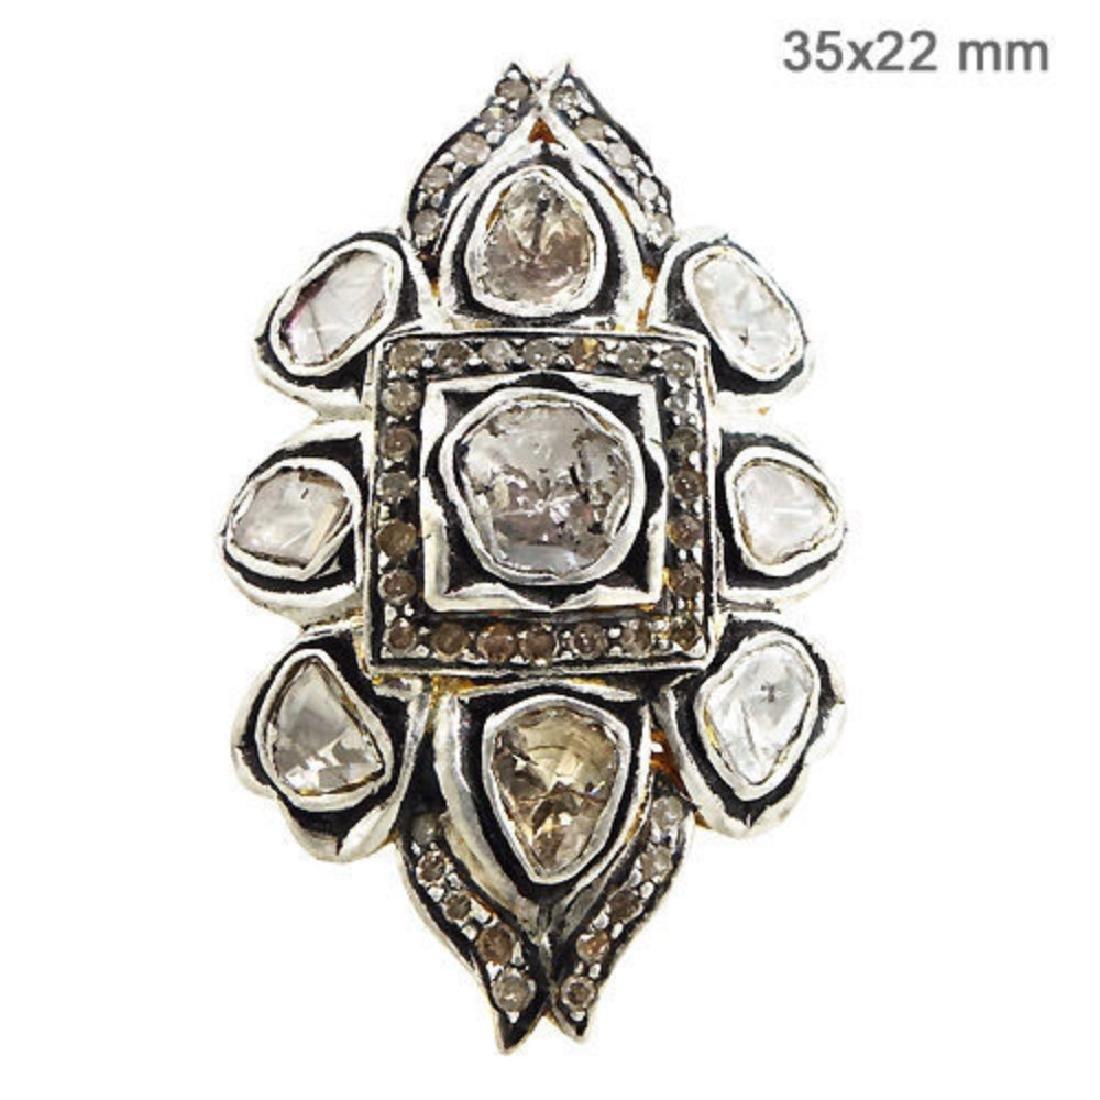 Natural Rose Cut Diamond Pave Ring. 14K Yellow Gold